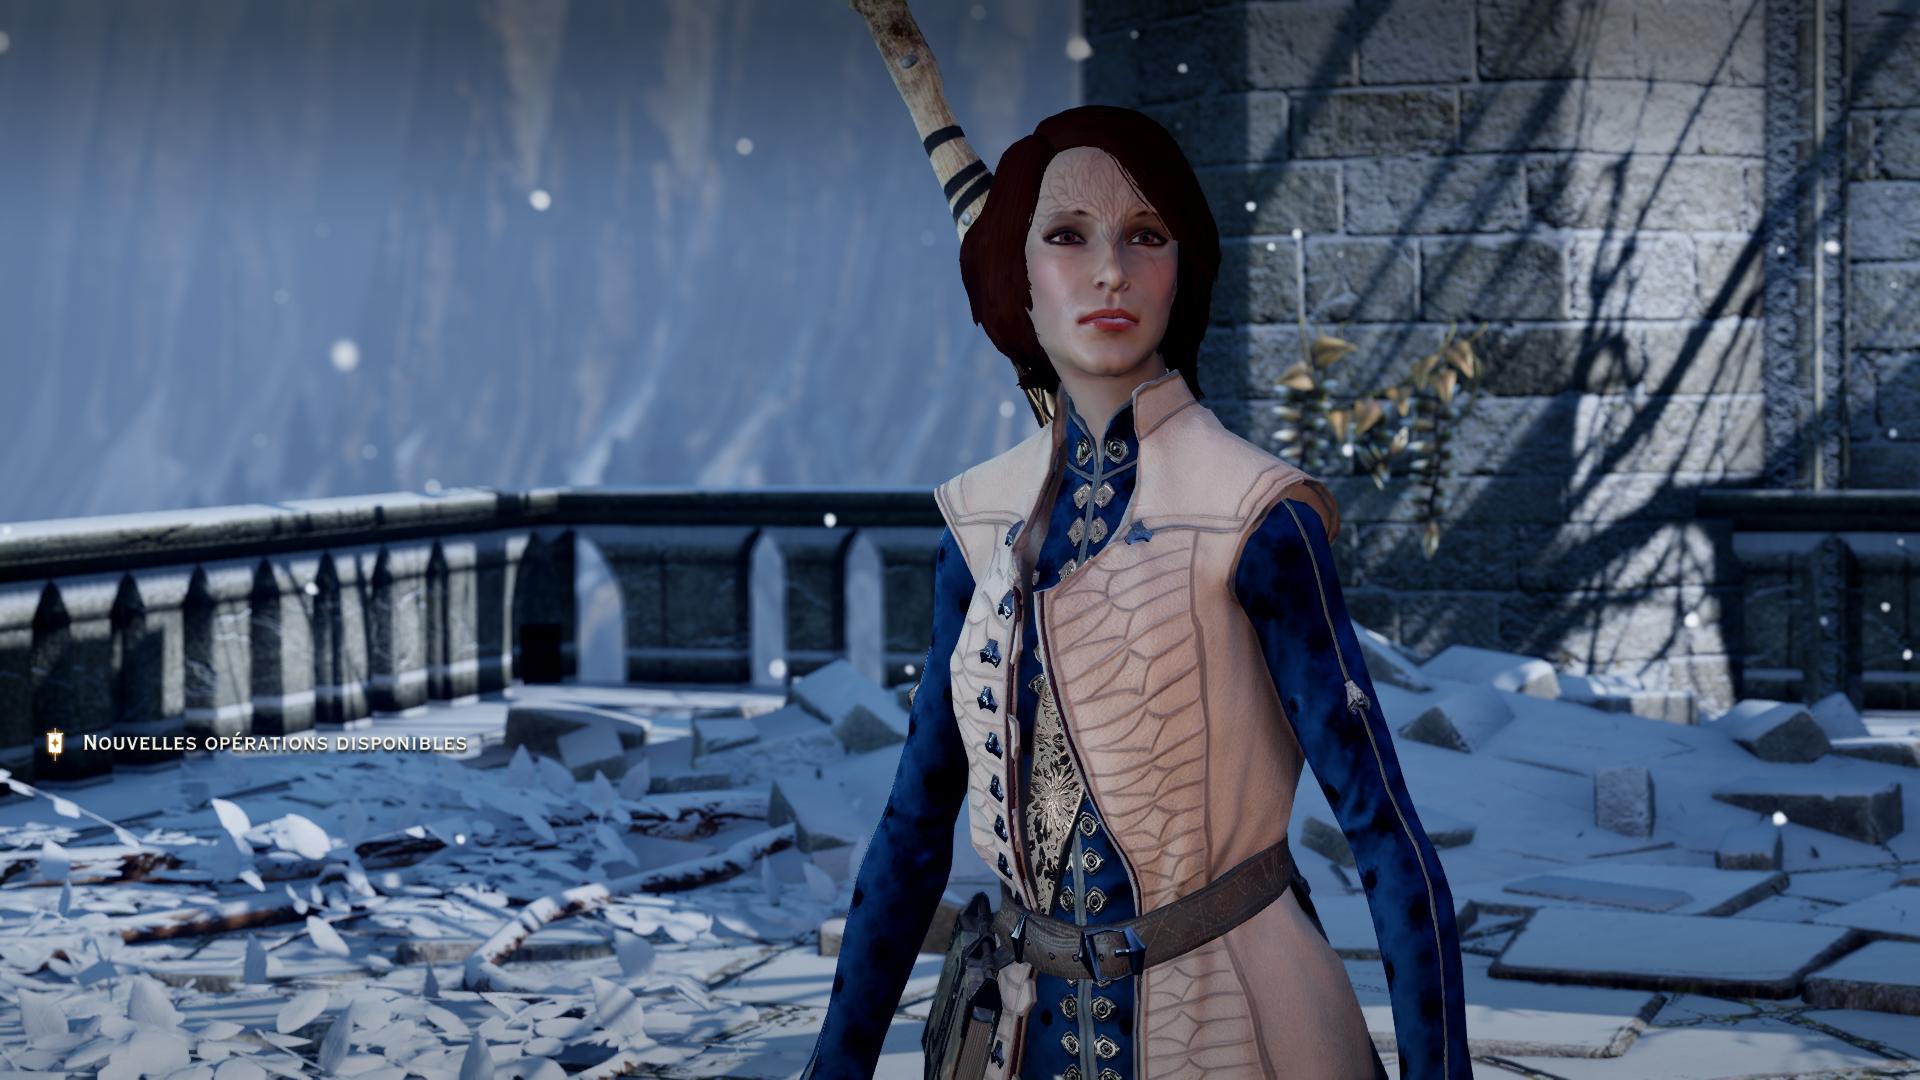 Les saga Dragon Age & Mass Effect - Page 2 1447194377-screenshotwin32-0213-final